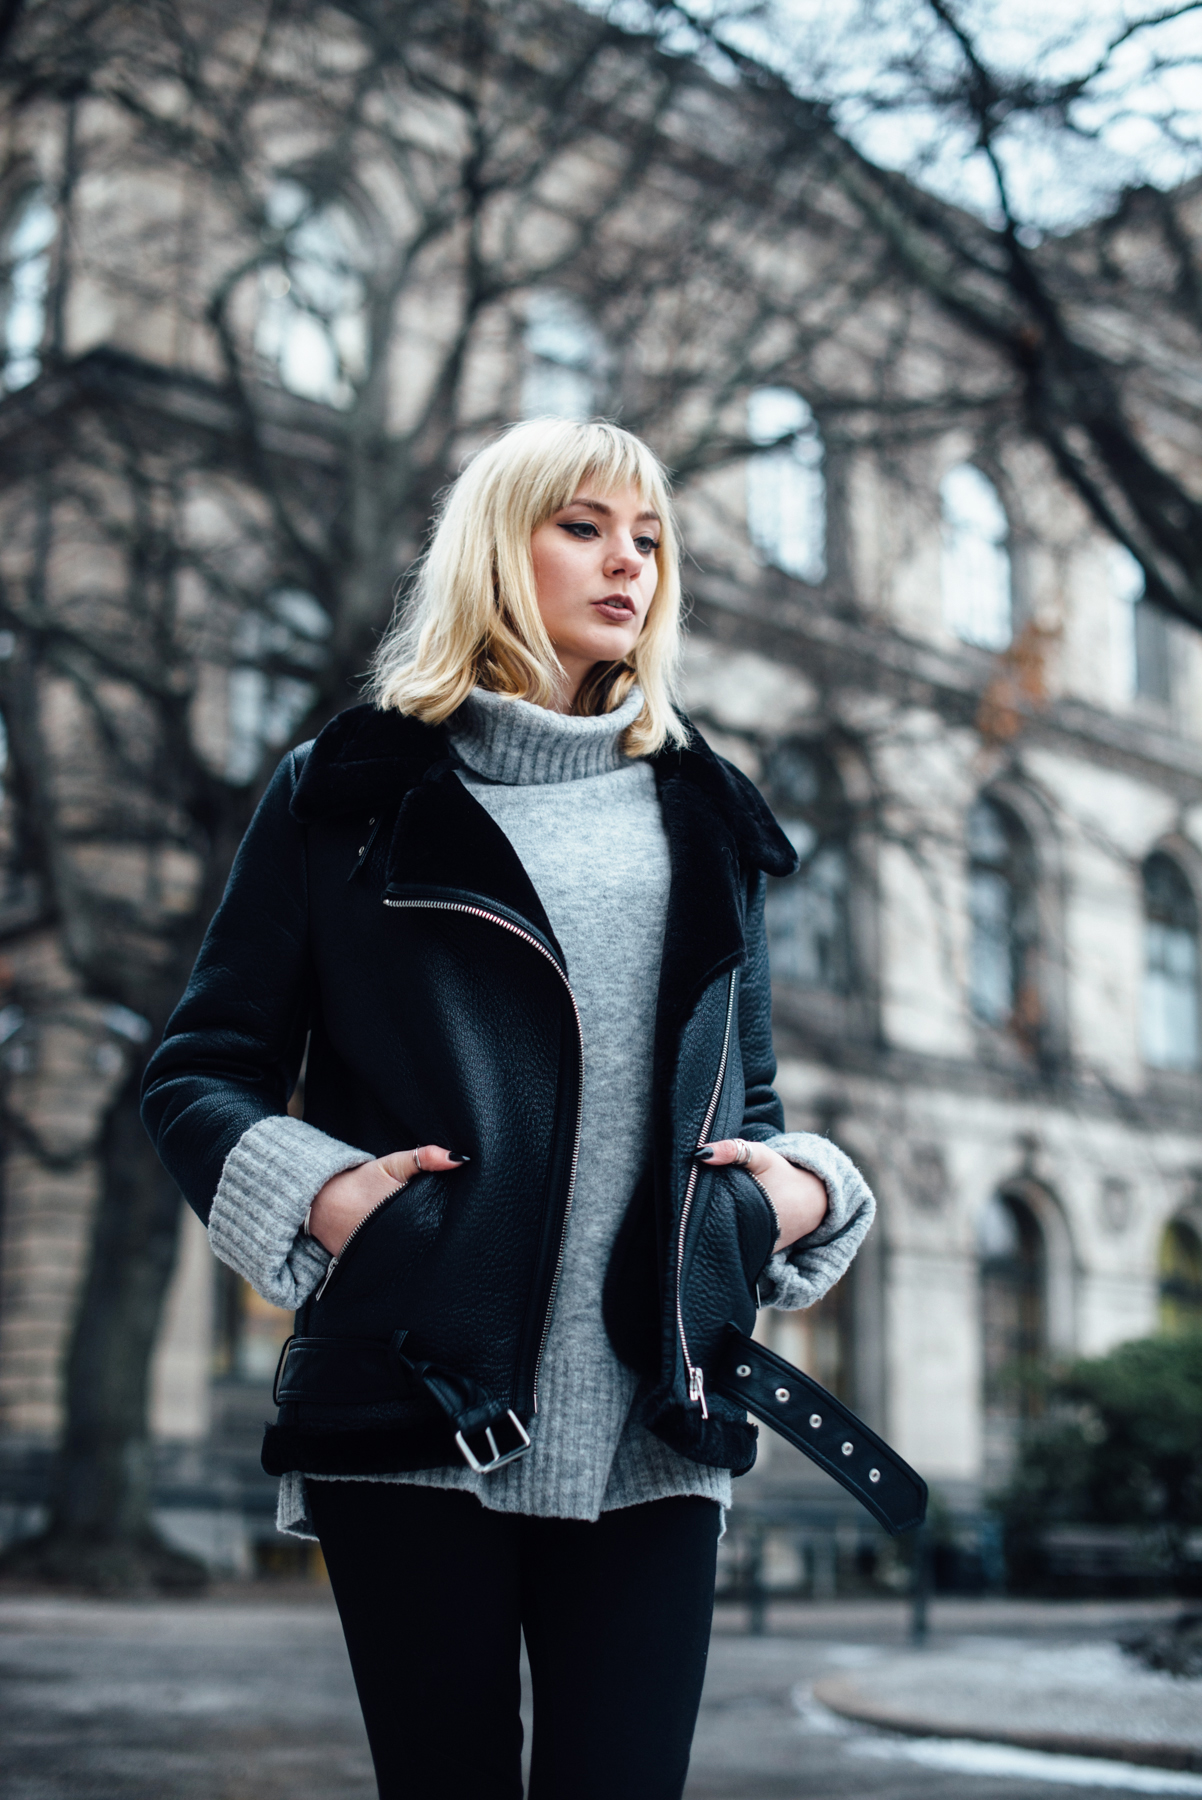 04-Kiamisu-Modeblog-Fashion Week Berlin_Shearling Jacke